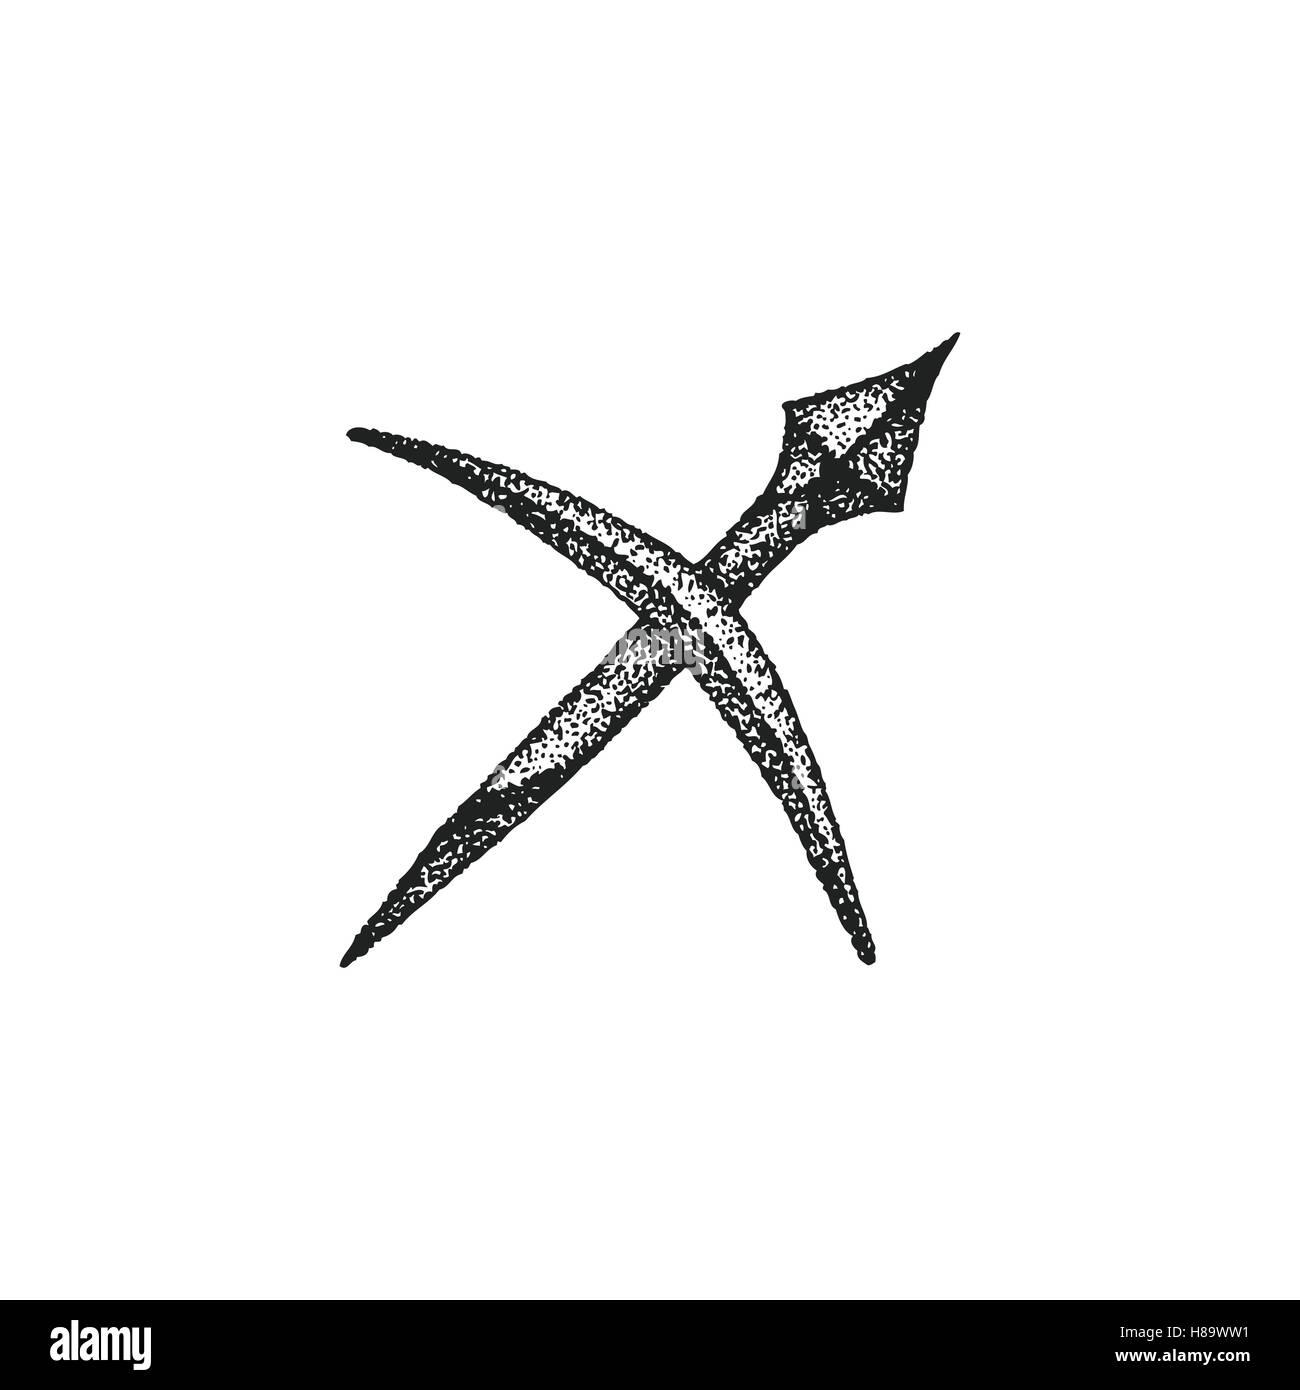 fb9e3419b113a vector black ink hand drawn dotwork tattoo style vintage design Sagittarius  zodiac sign retro illustration isolated white backgr